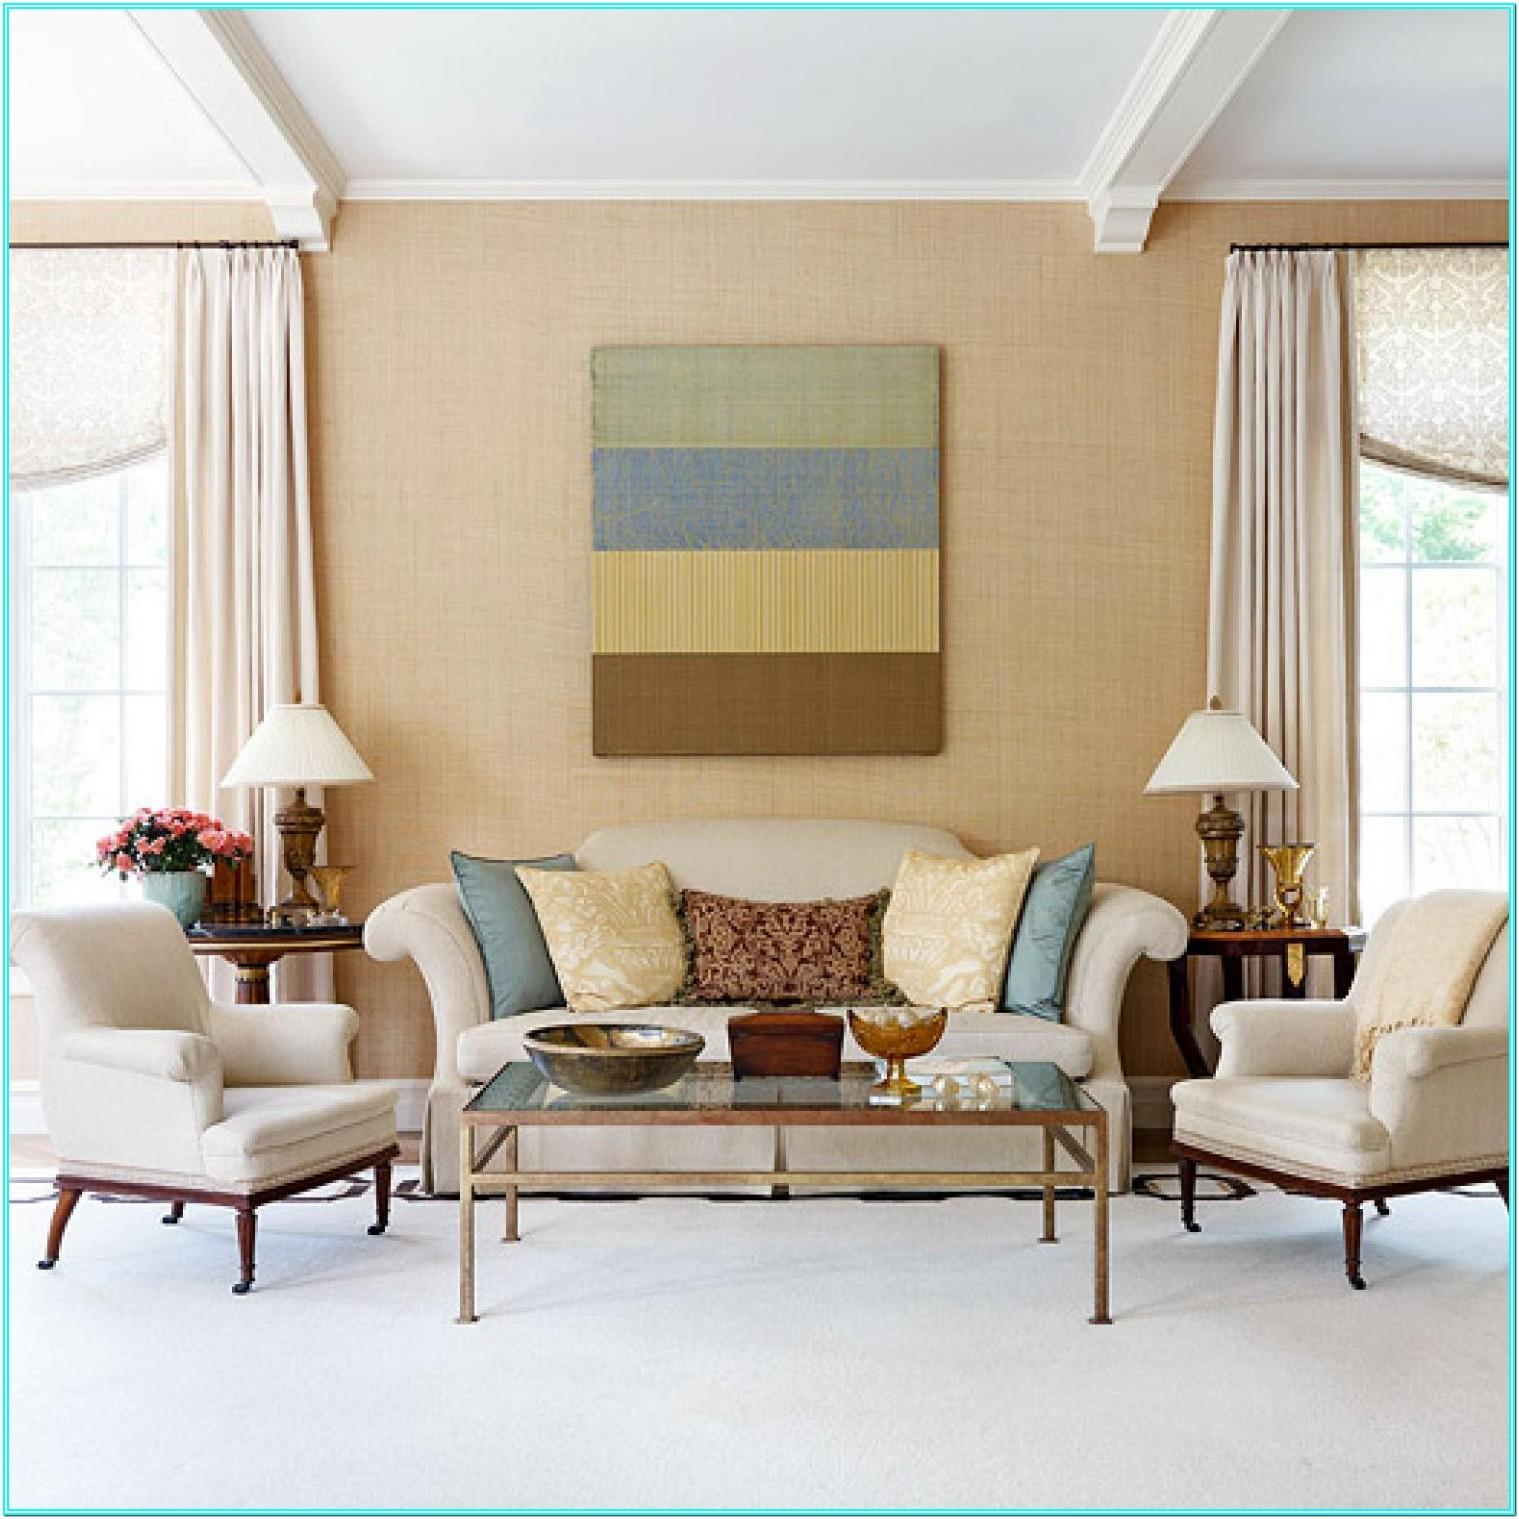 Living Room House Decoration Design